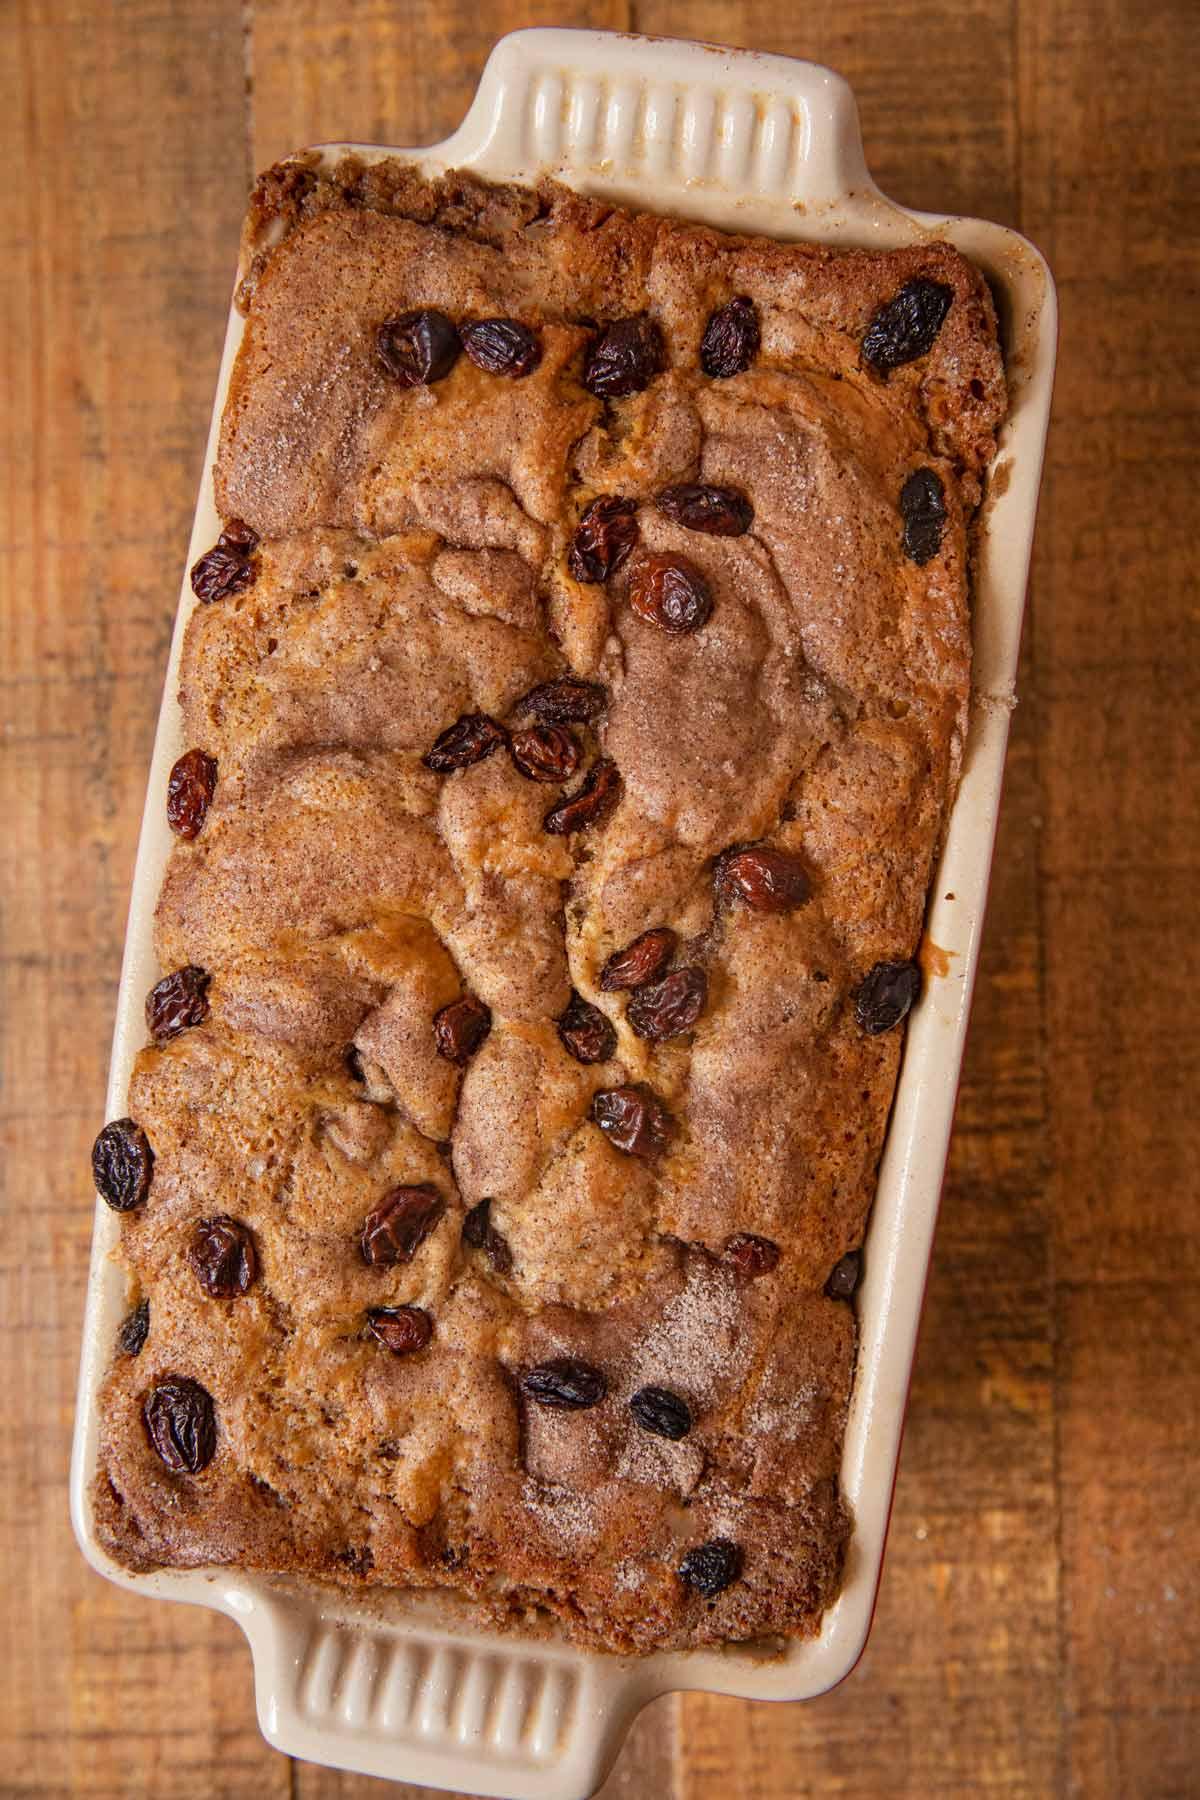 Cinnamon Raisin Bread in loaf pan